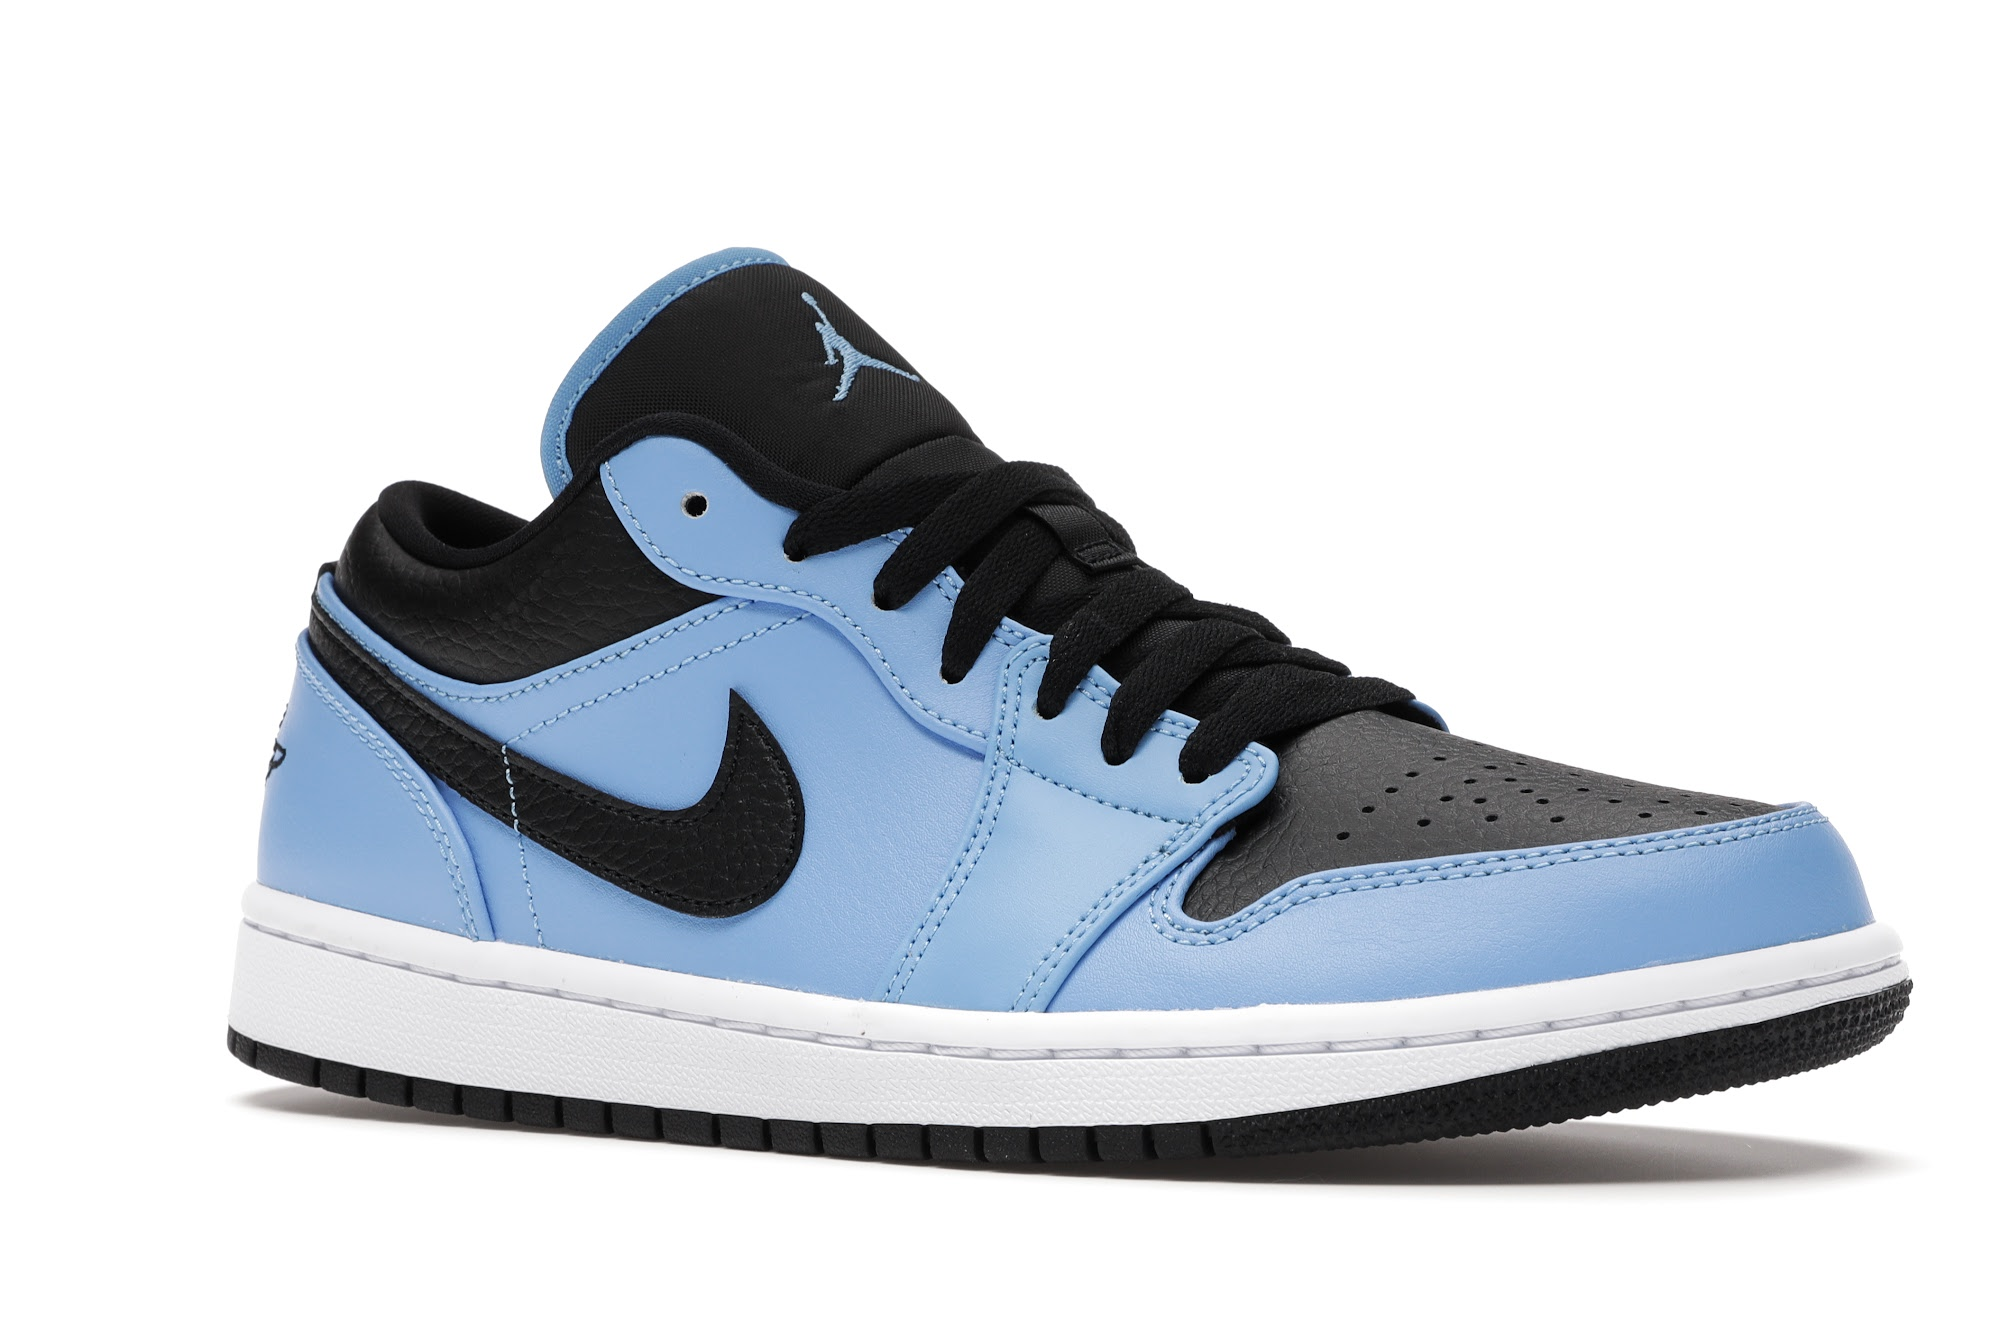 Jordan 1 Low University Blue Black - 553558-403